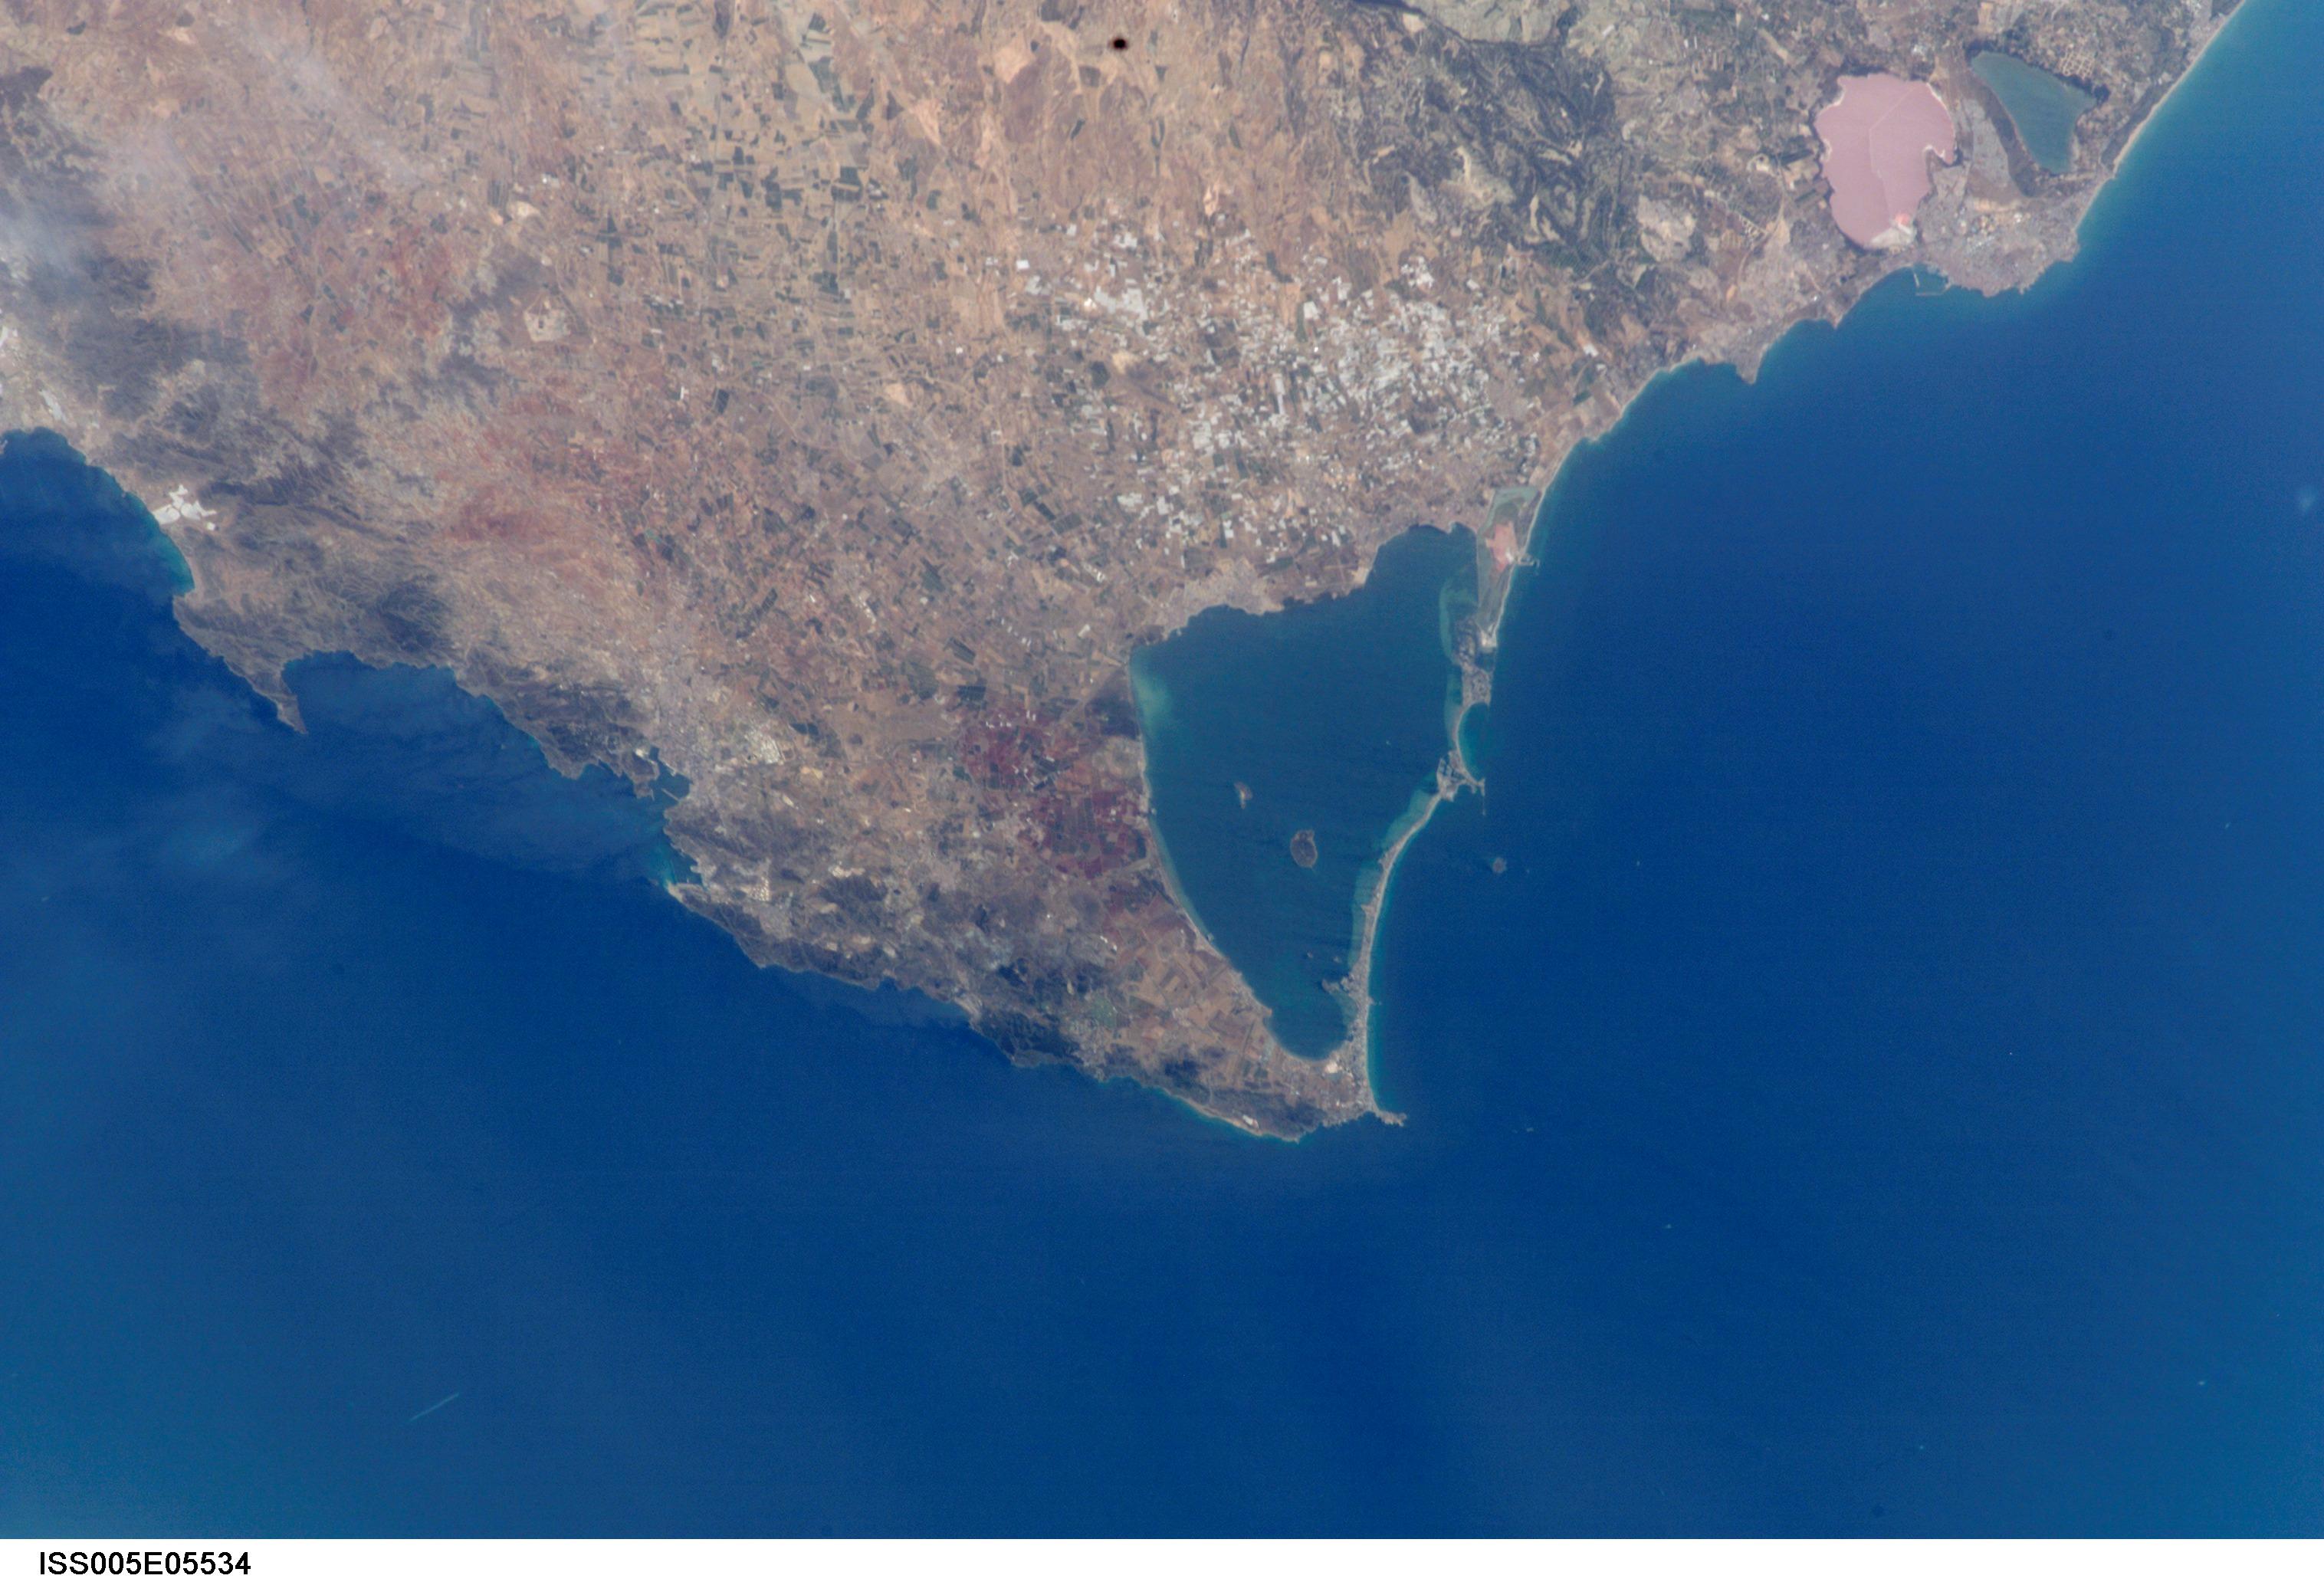 Satellite view of the Mar Menor